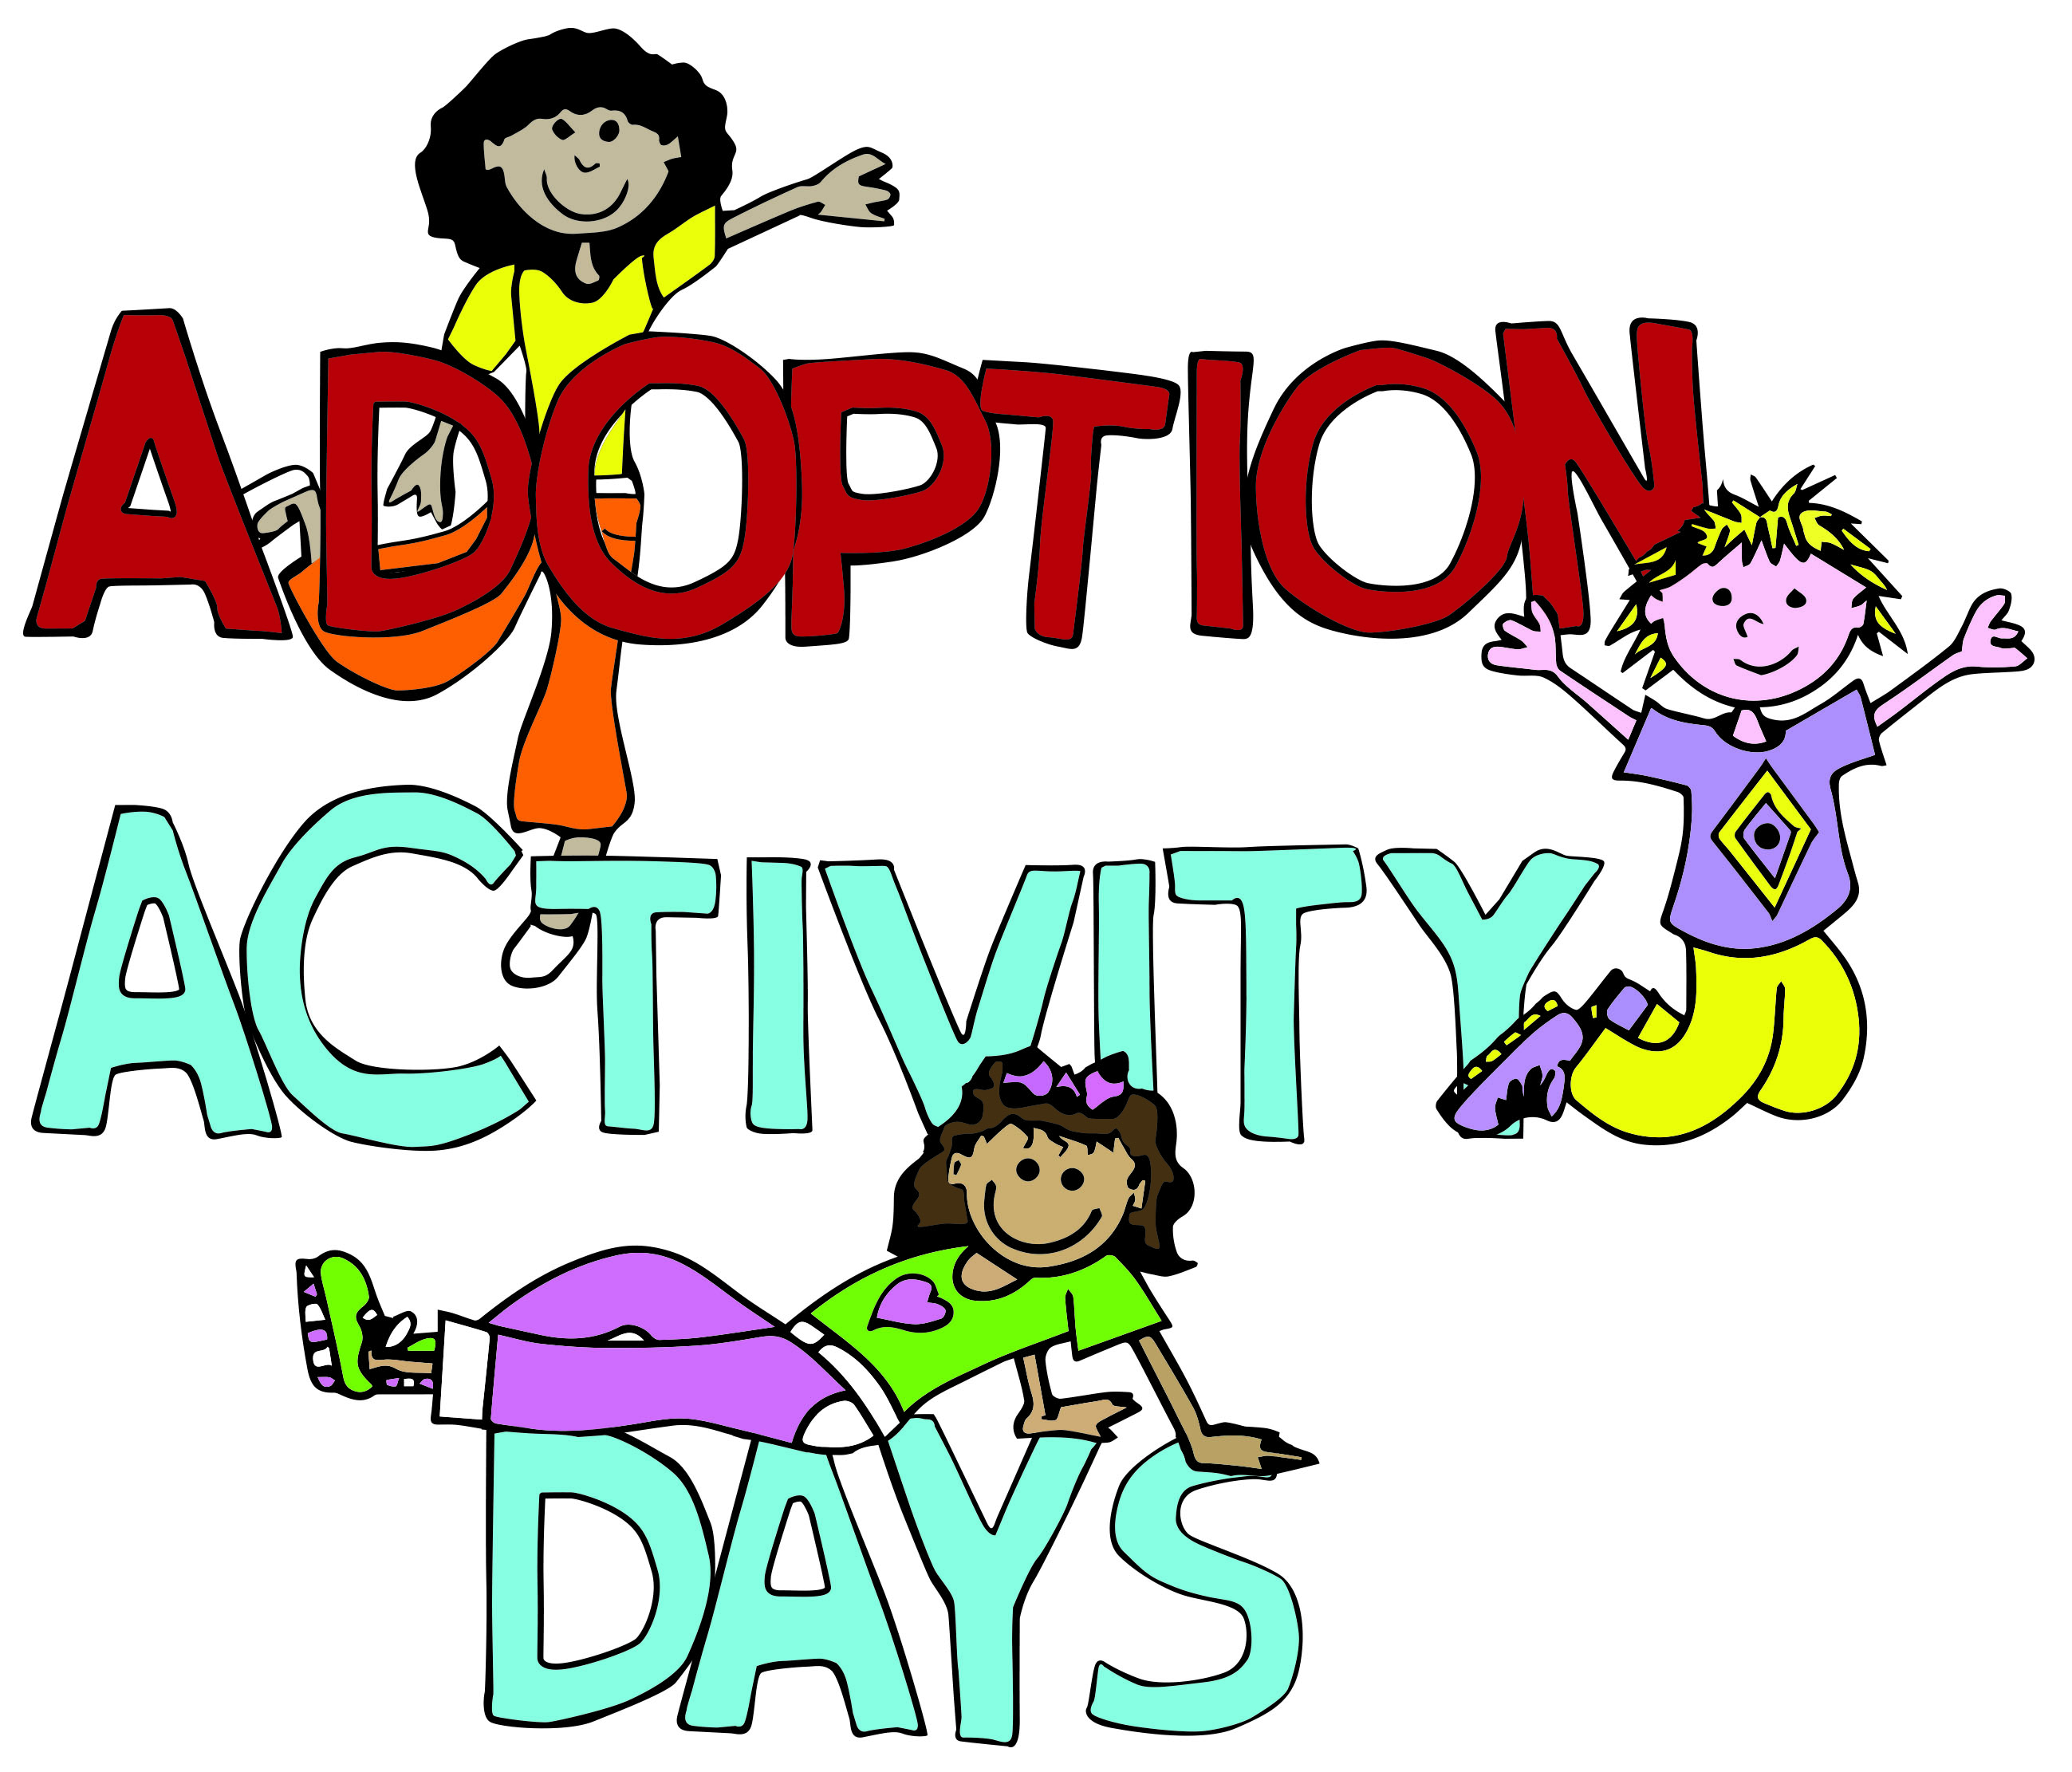 Adoption Activity Days.